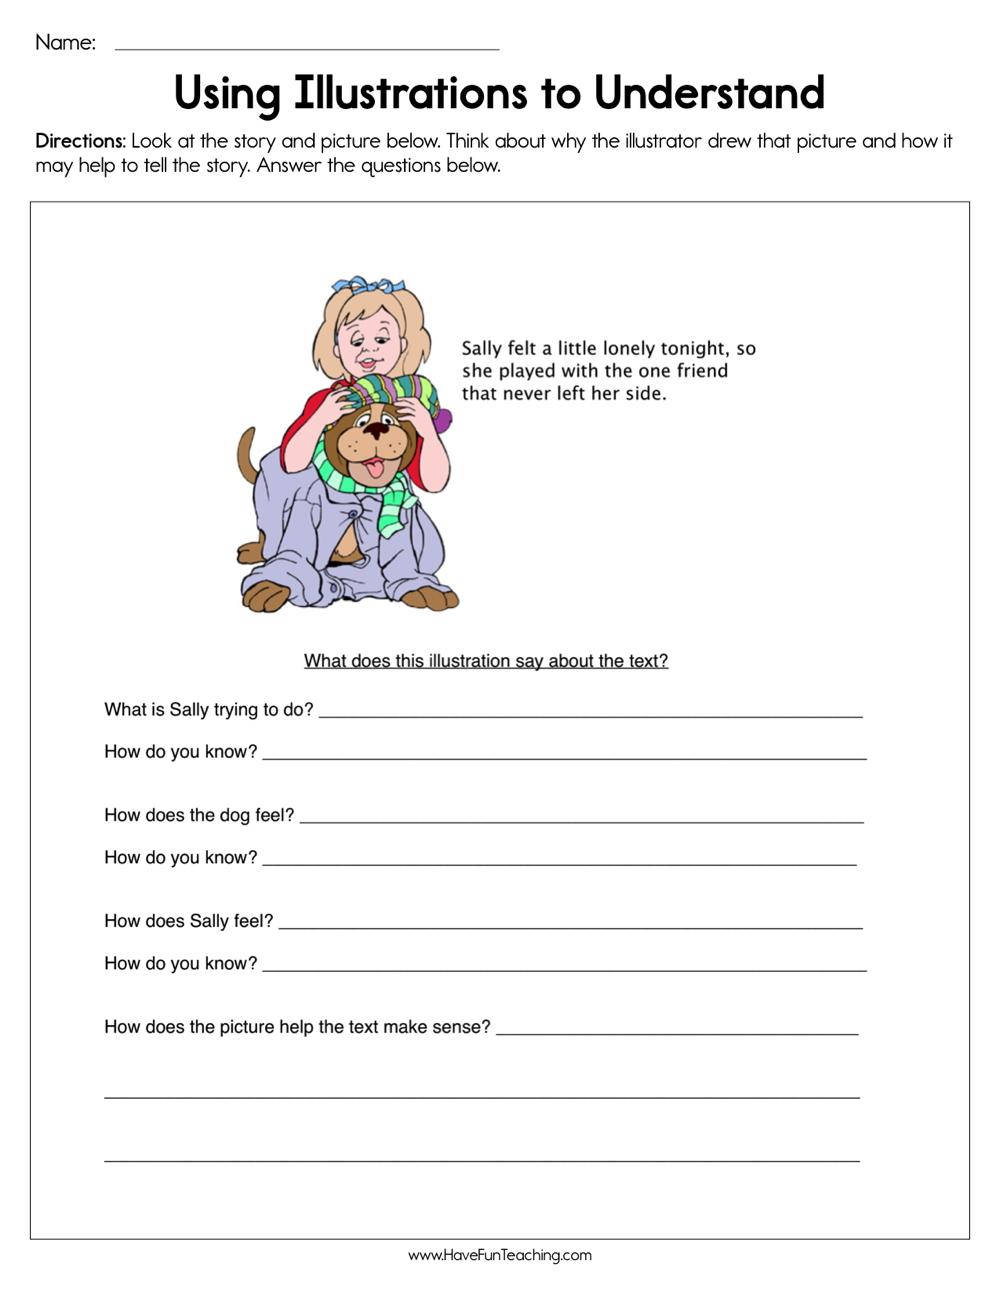 Using Illustrations to Understand Worksheet